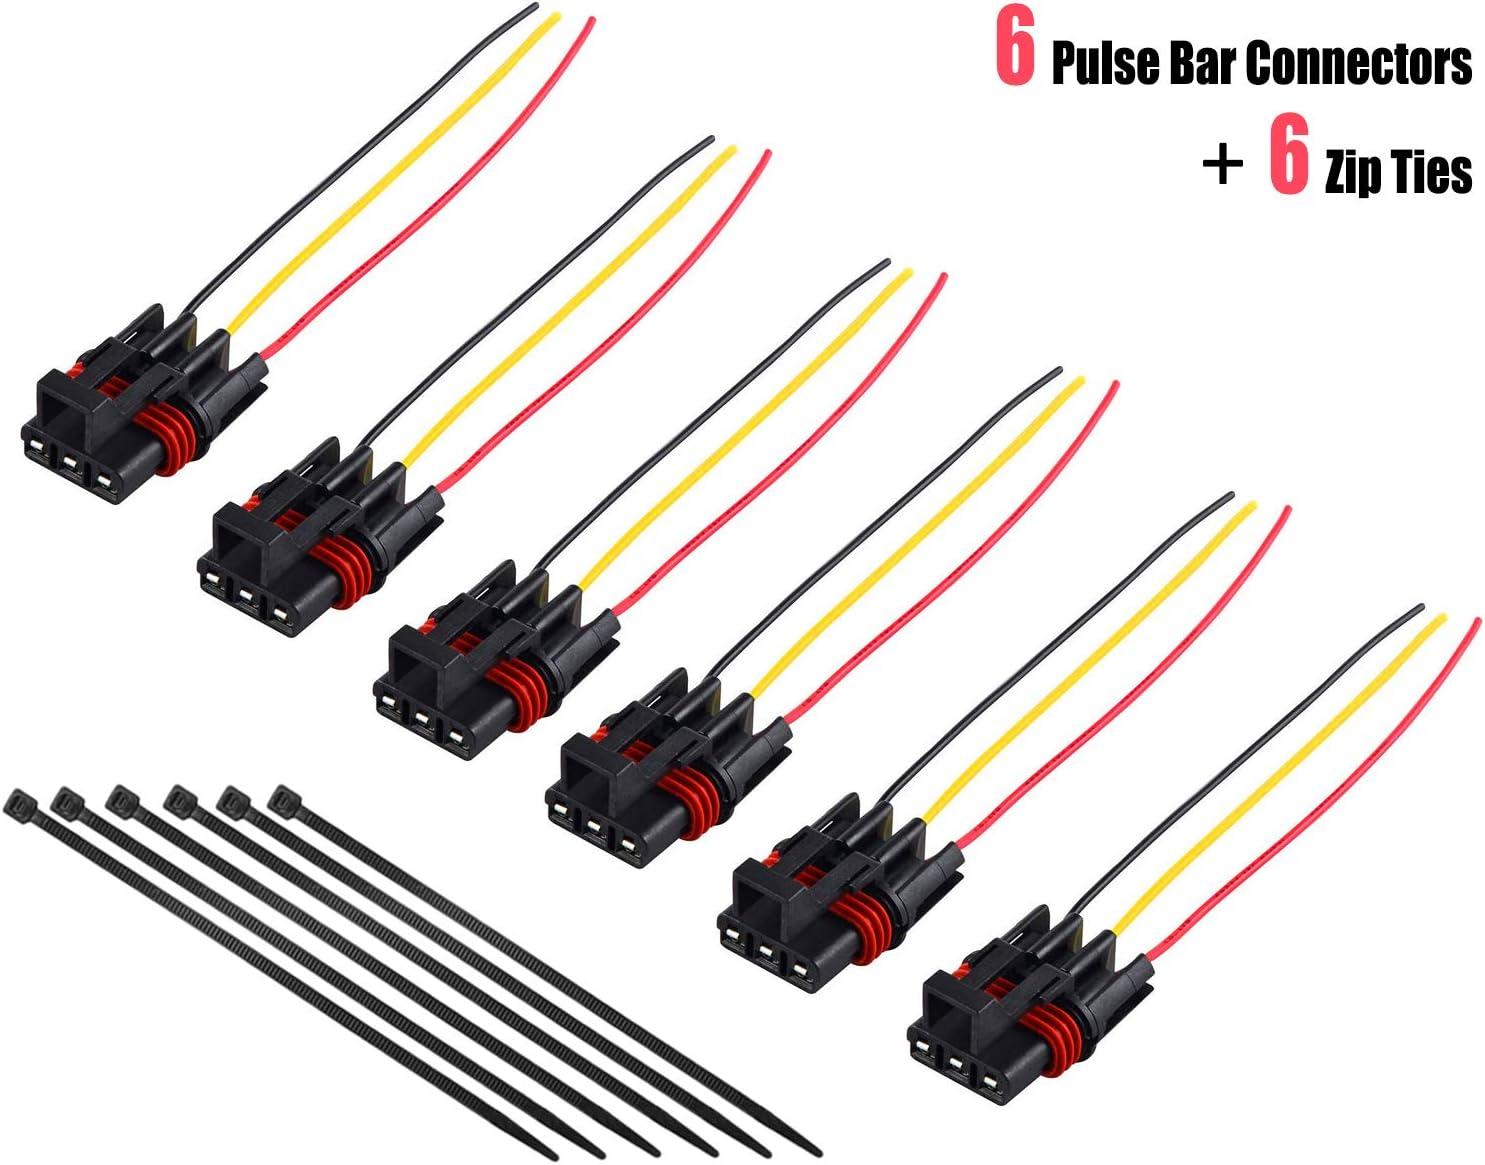 Amazon.com: UNIGT Pulse Power Plug Connector Pigtail Compatible with Polaris  RZR/Pro Ranger XP 1000 RS1 General Pulse Bus Bar Power Harness Connector 6  Pack - 2018-2021: AutomotiveAmazon.com